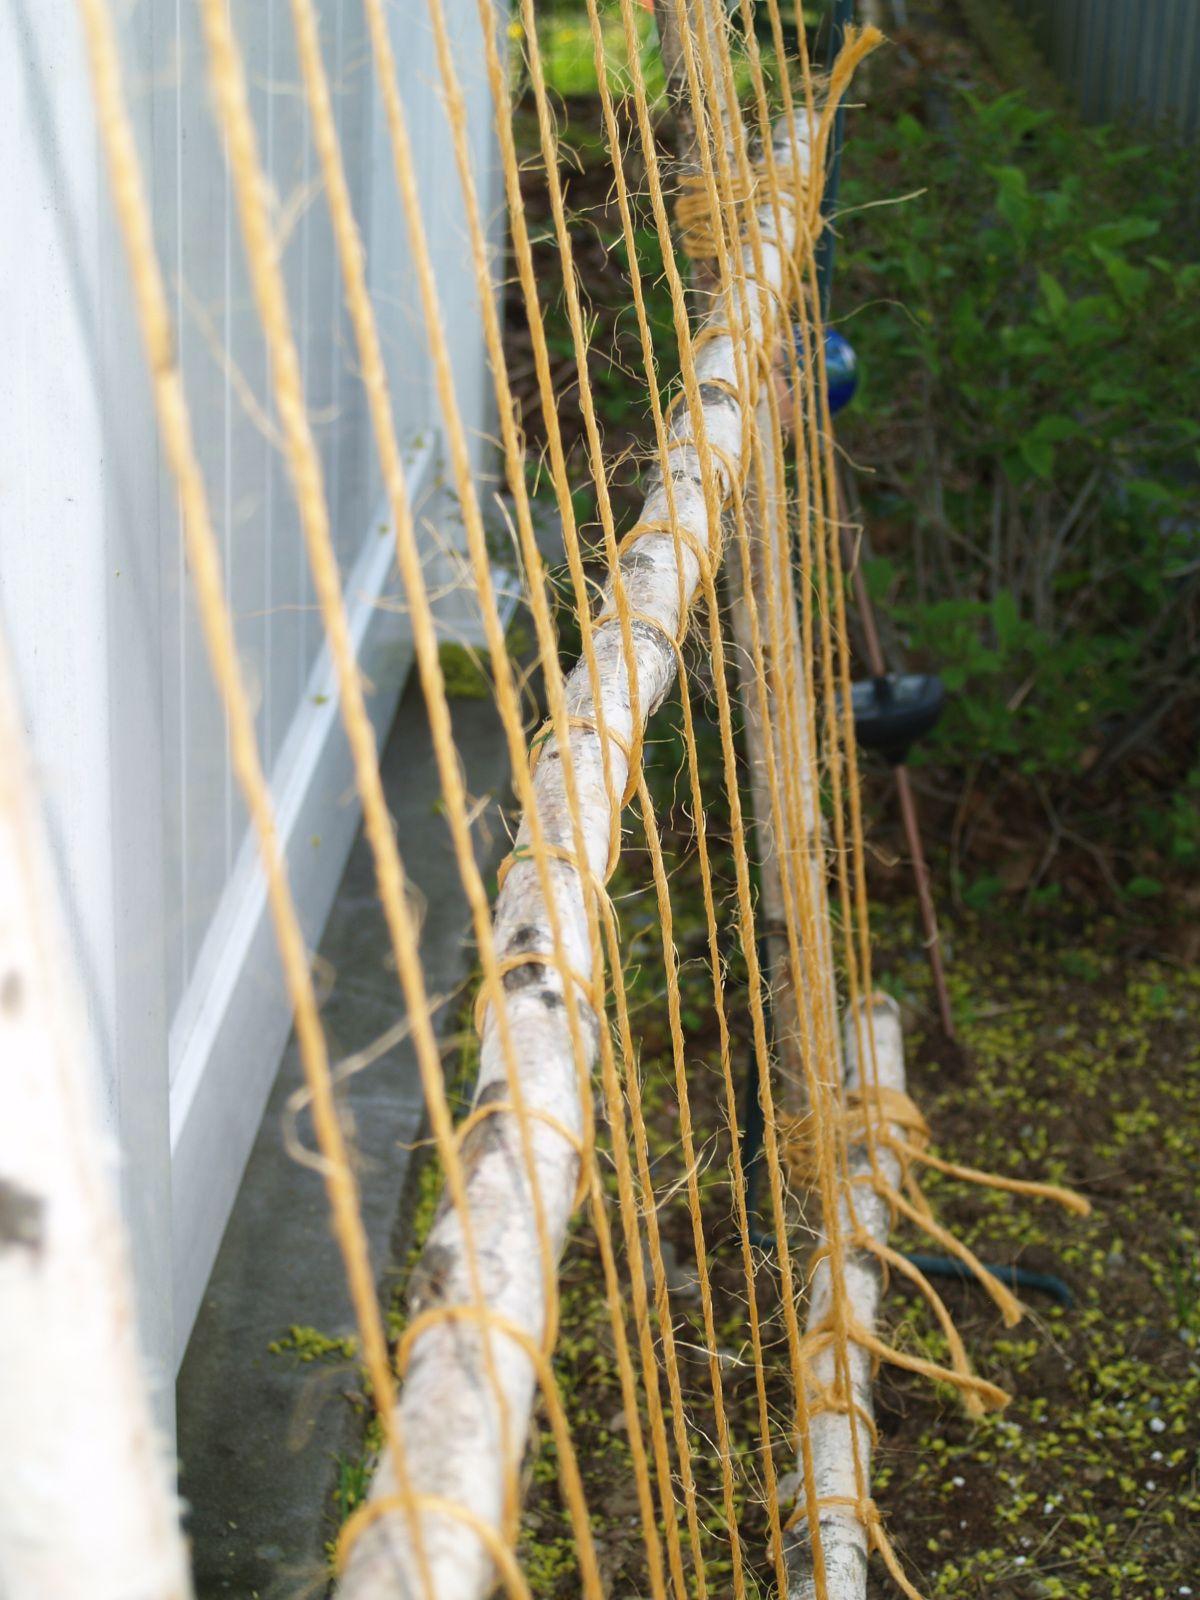 Diy. Simple string bean trellis | Garden beans and peas | Pinterest ...